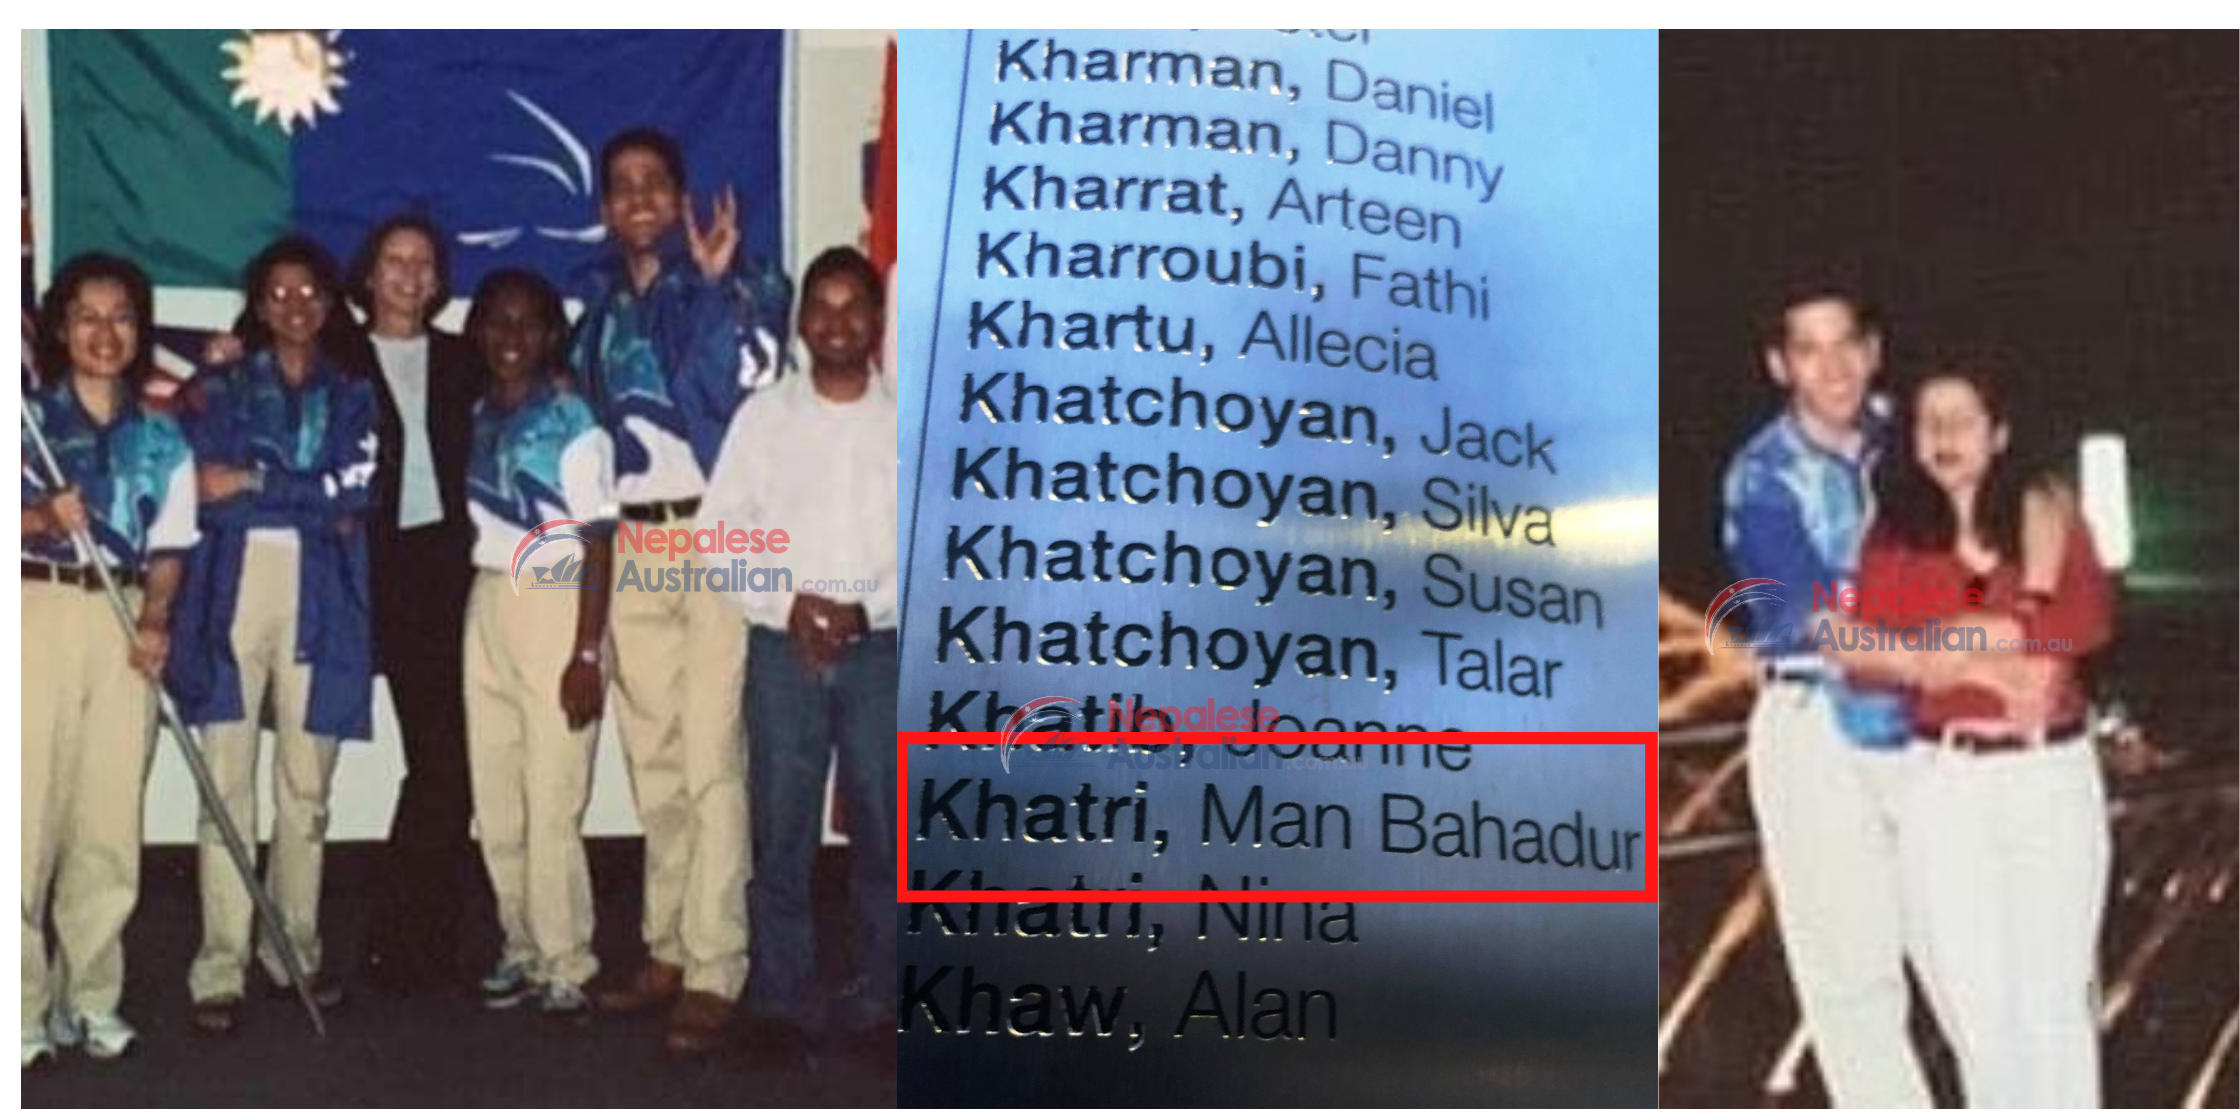 Sydney Olympic Games 2000- Nepalese Volunteer Man Bhadur Khatri